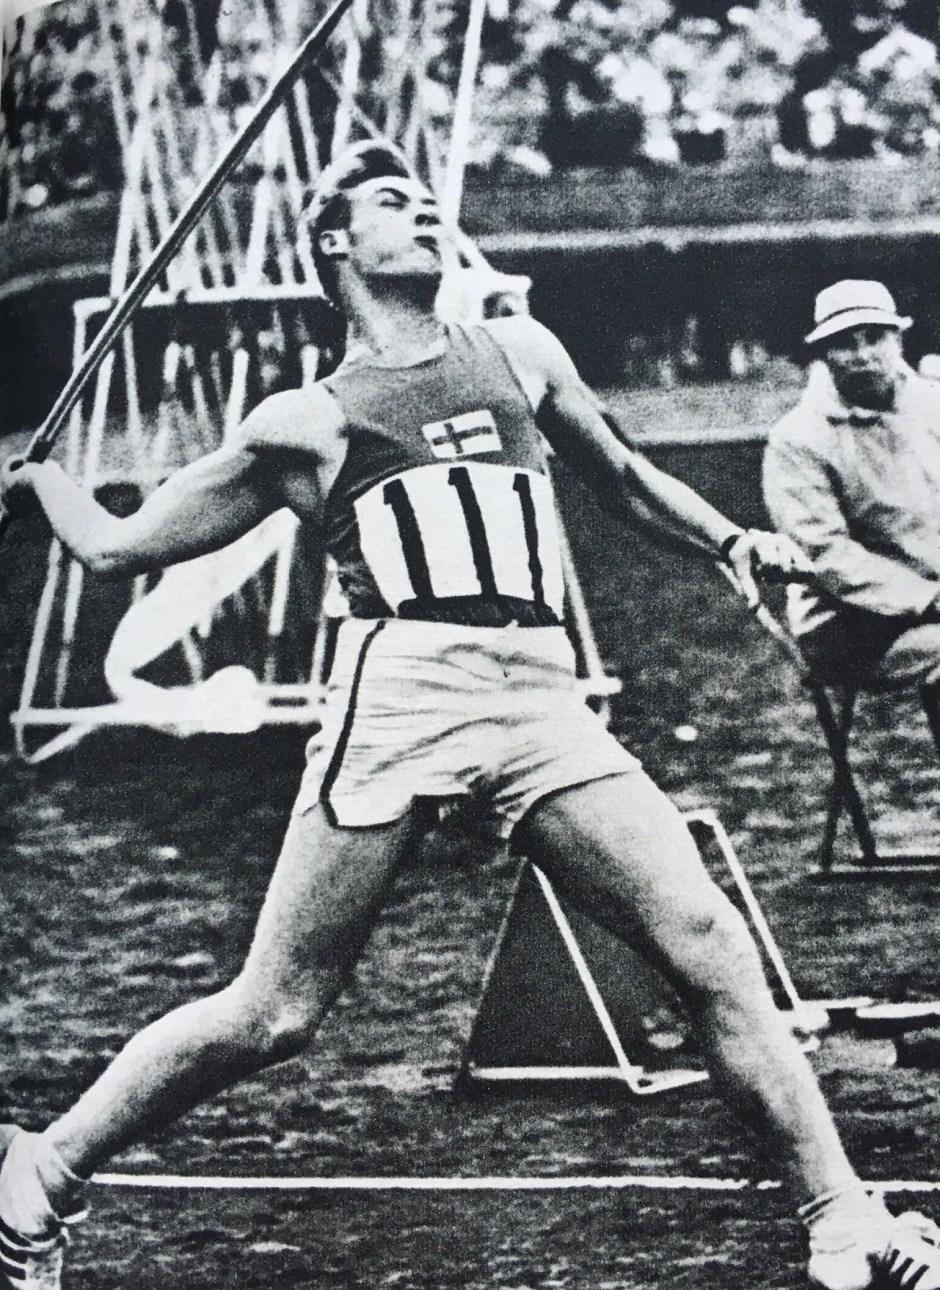 Pauli Nevala throwing in Tokyo_Tokyo Olympiad Kyodo News Agency